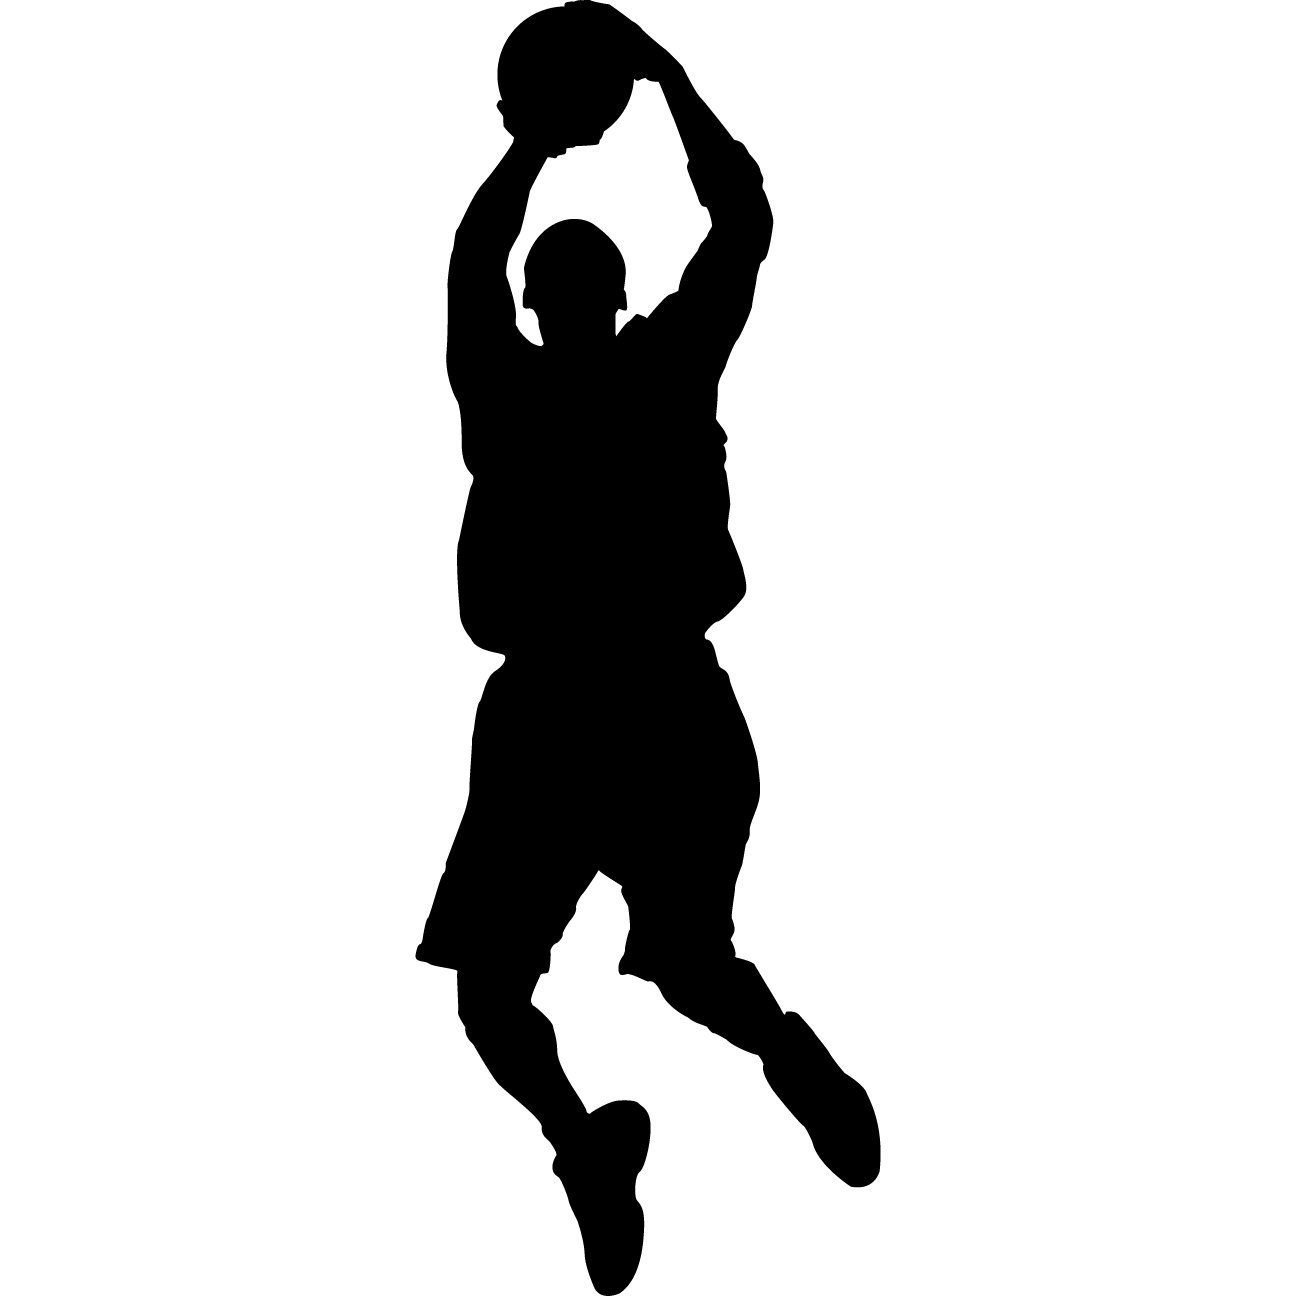 1296x1296 Basketball Silhouette Clipart (26+)